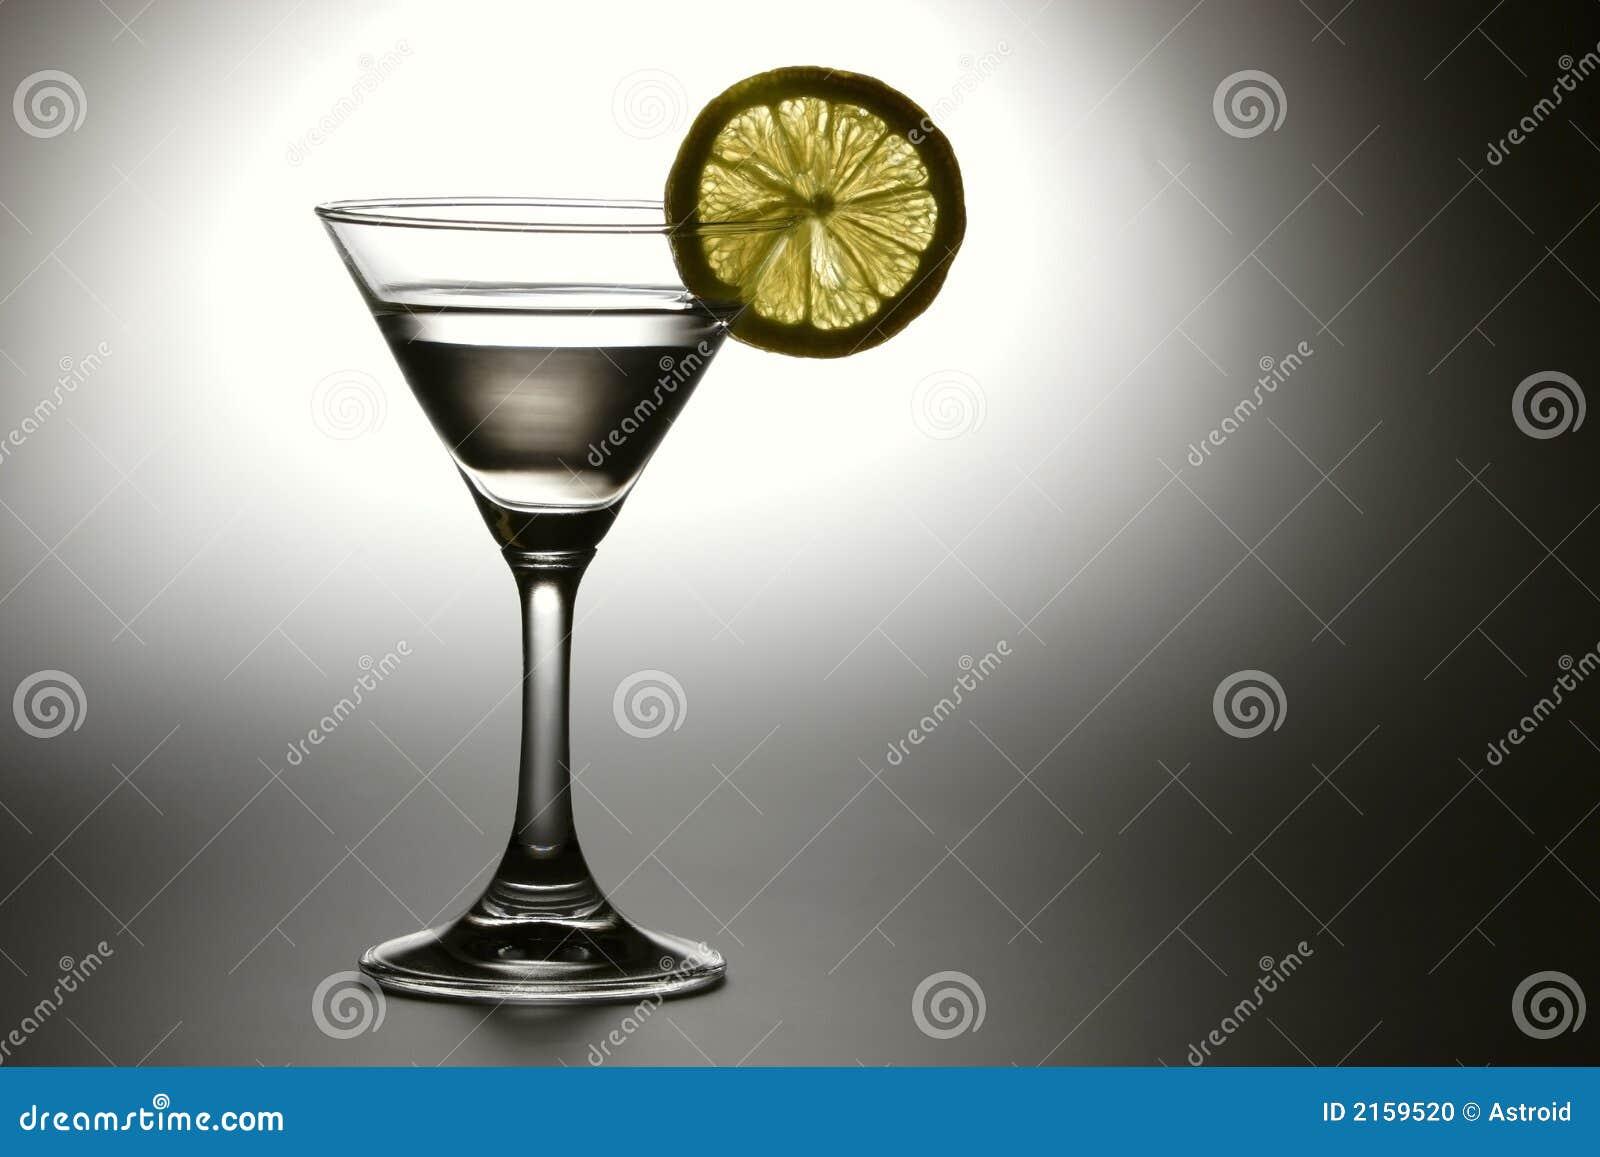 Drinkcitron - yellow